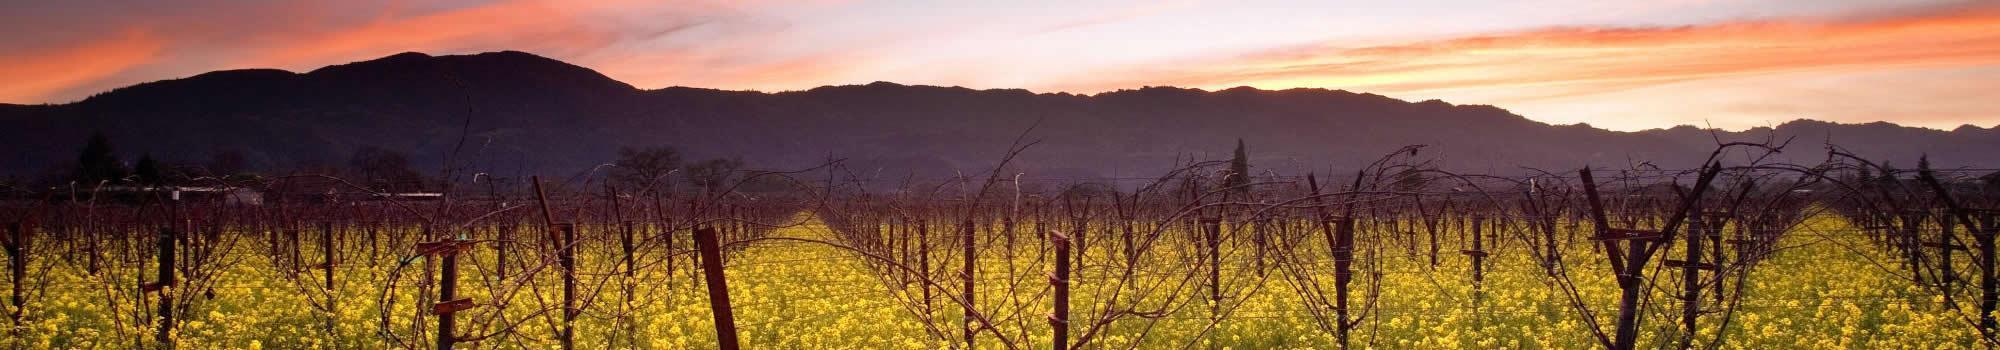 sunset-wild-mustard-napa-valley-vineyards-california-72172